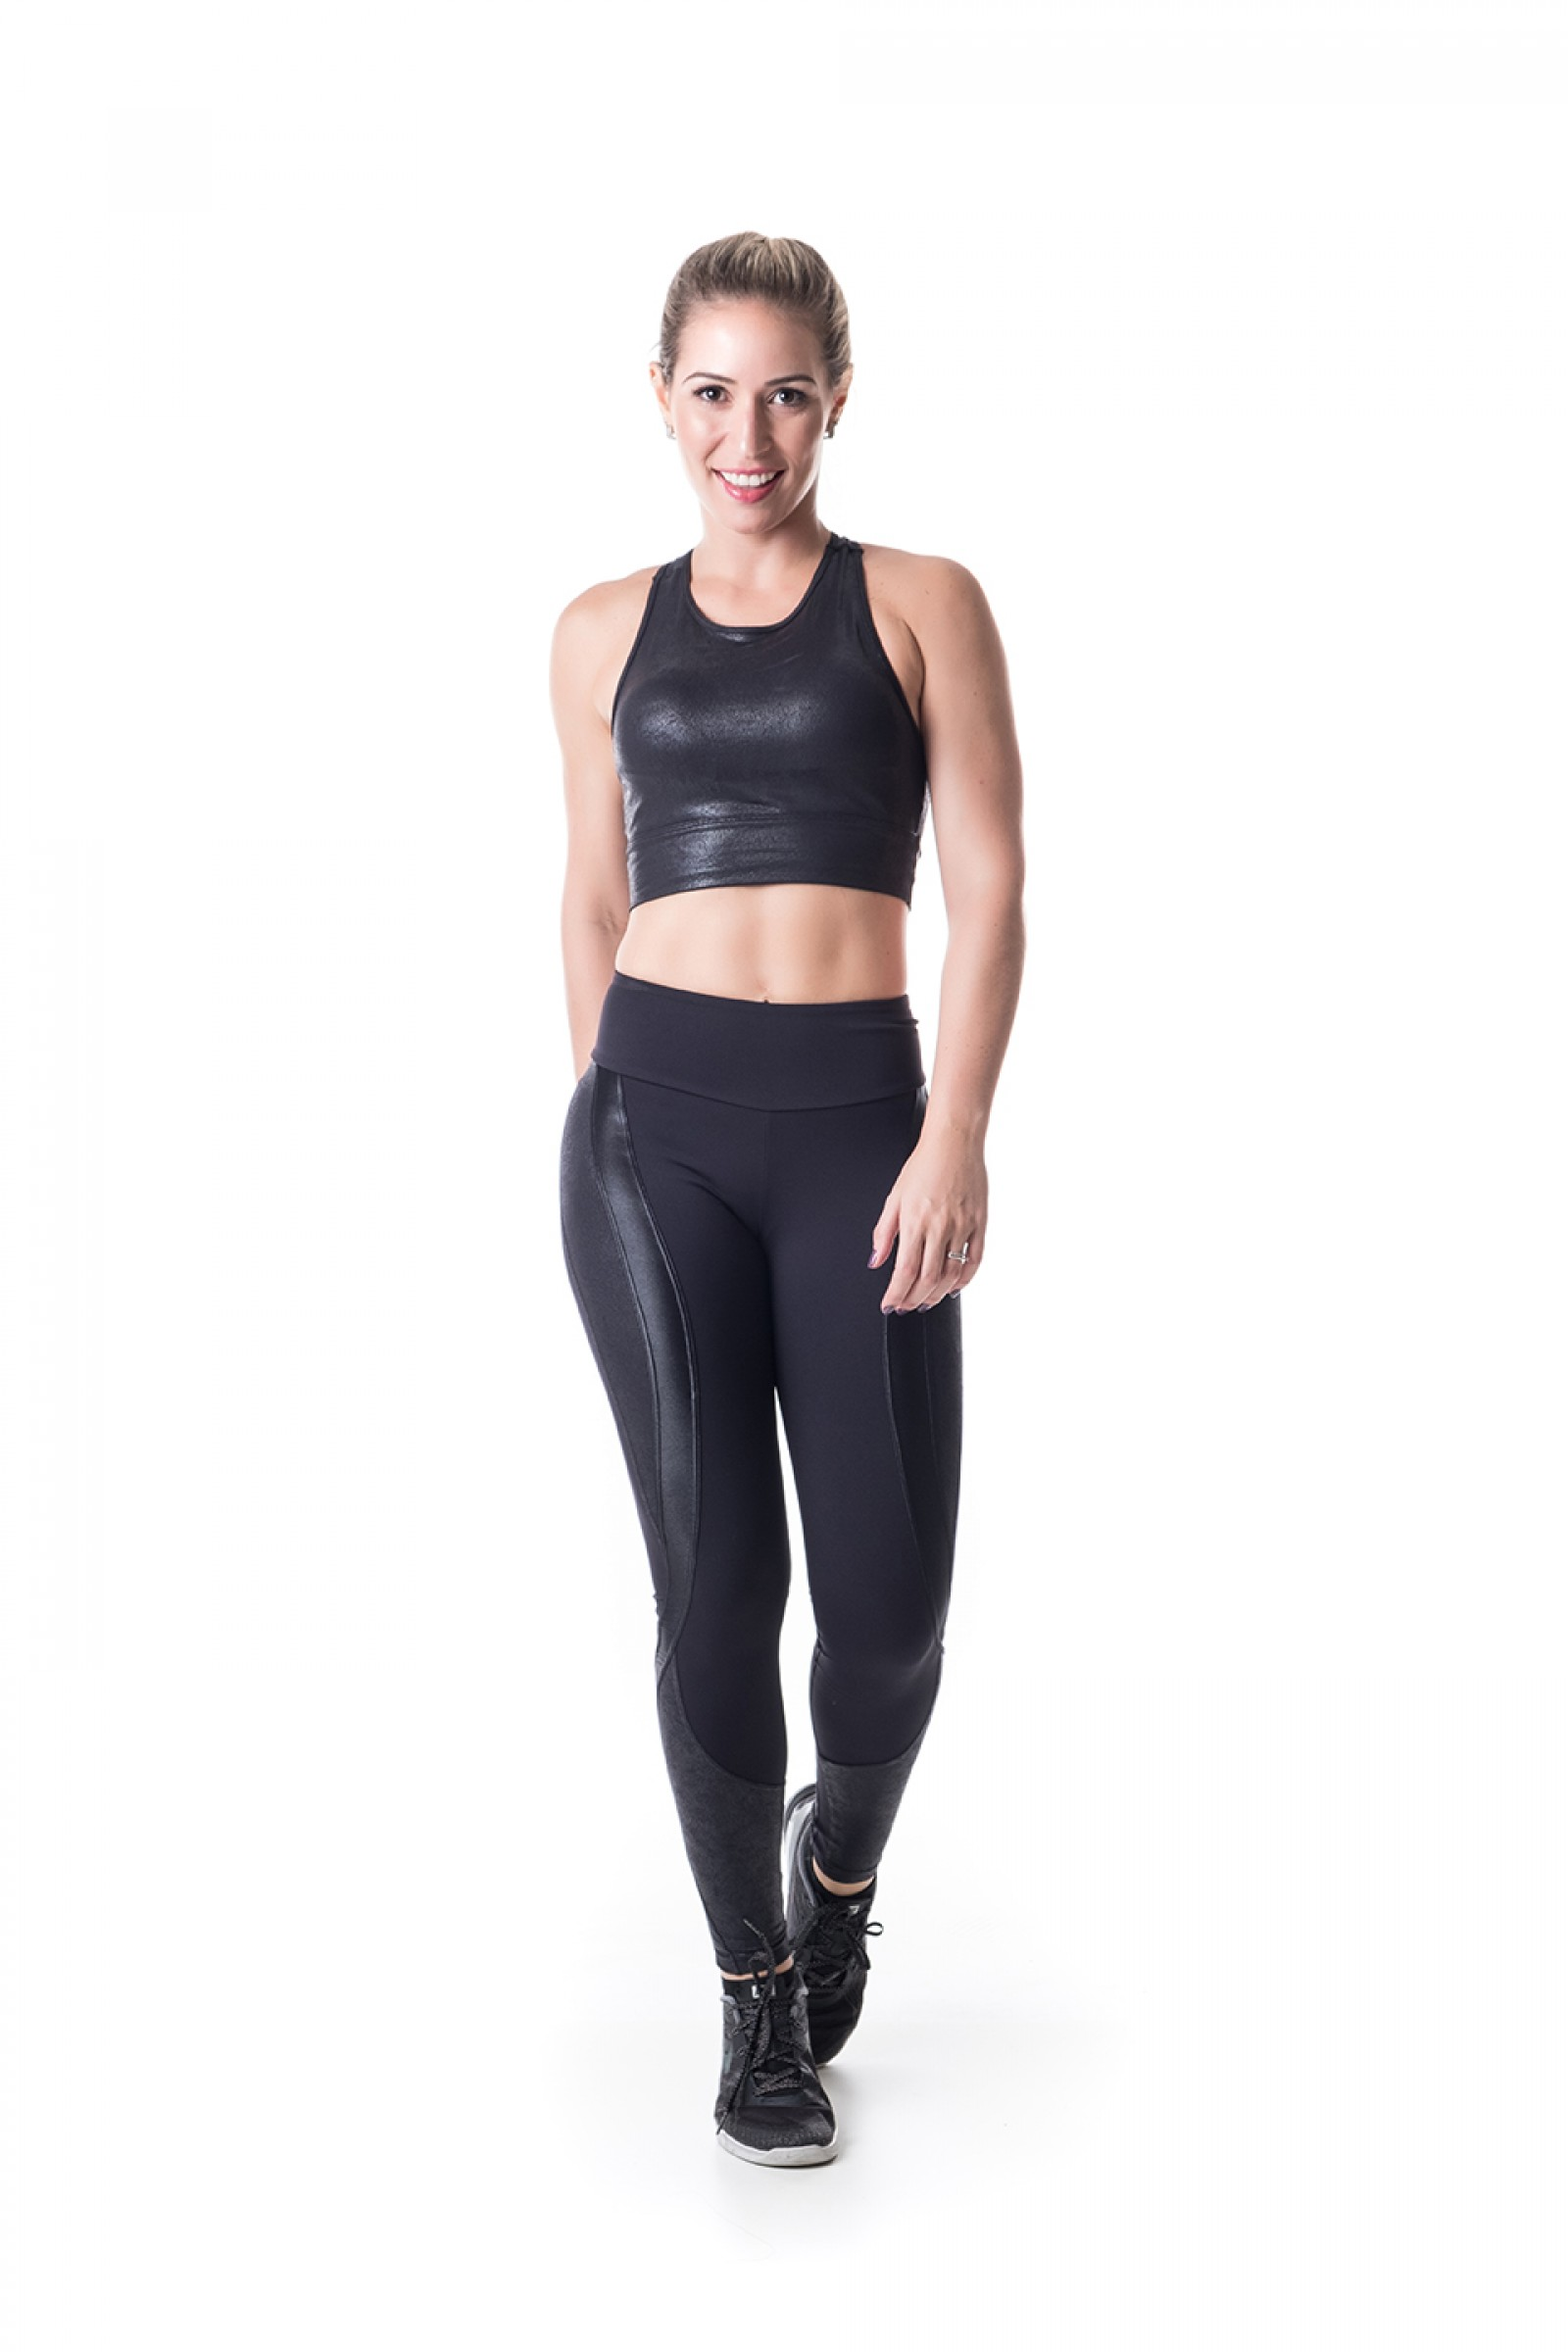 Legging Lead Preto Crak, Coleção Challenge - NKT Fitwear Moda Fitness